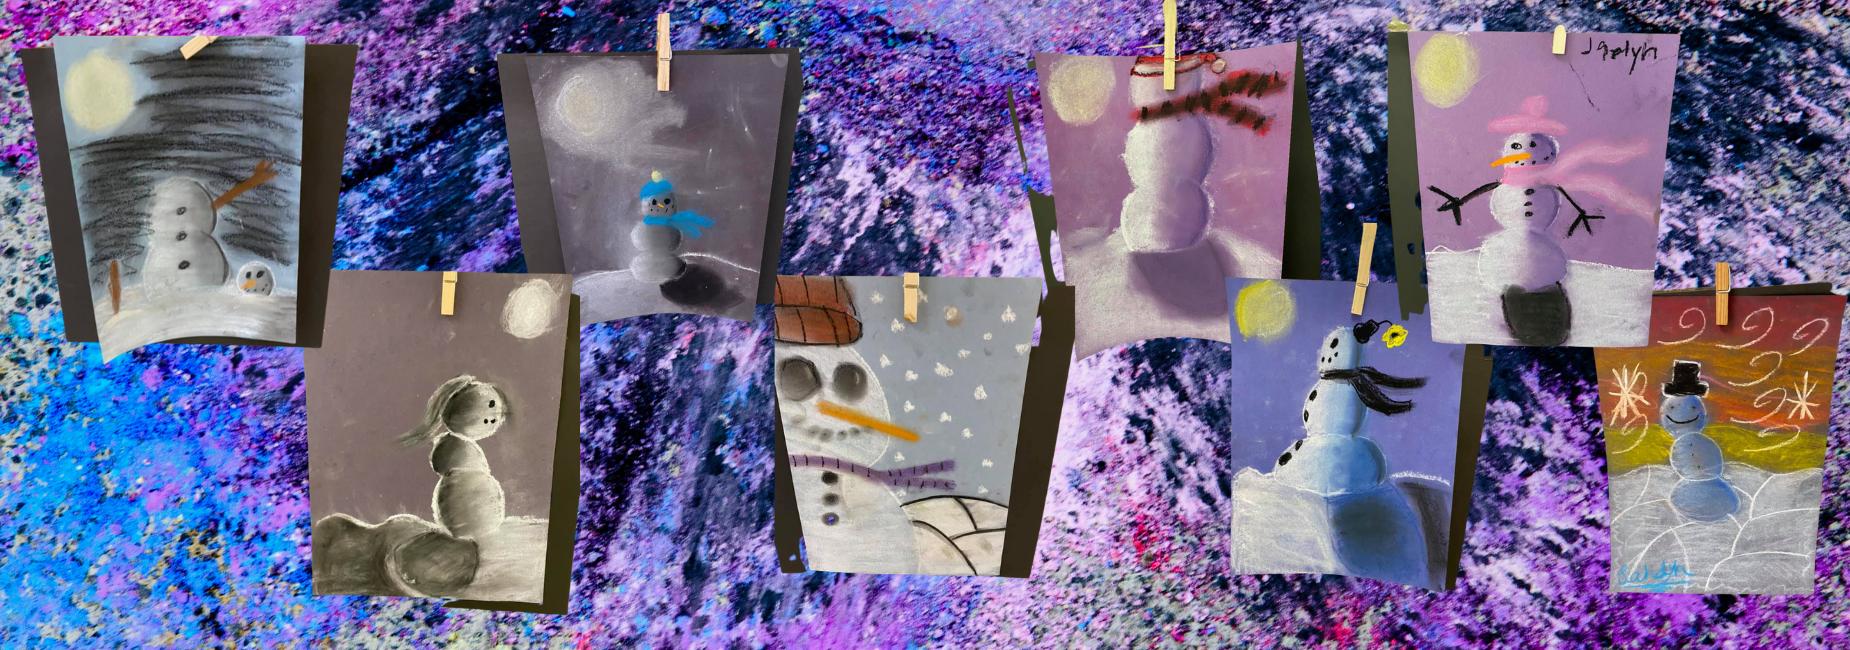 collage of chalk art of snowmen